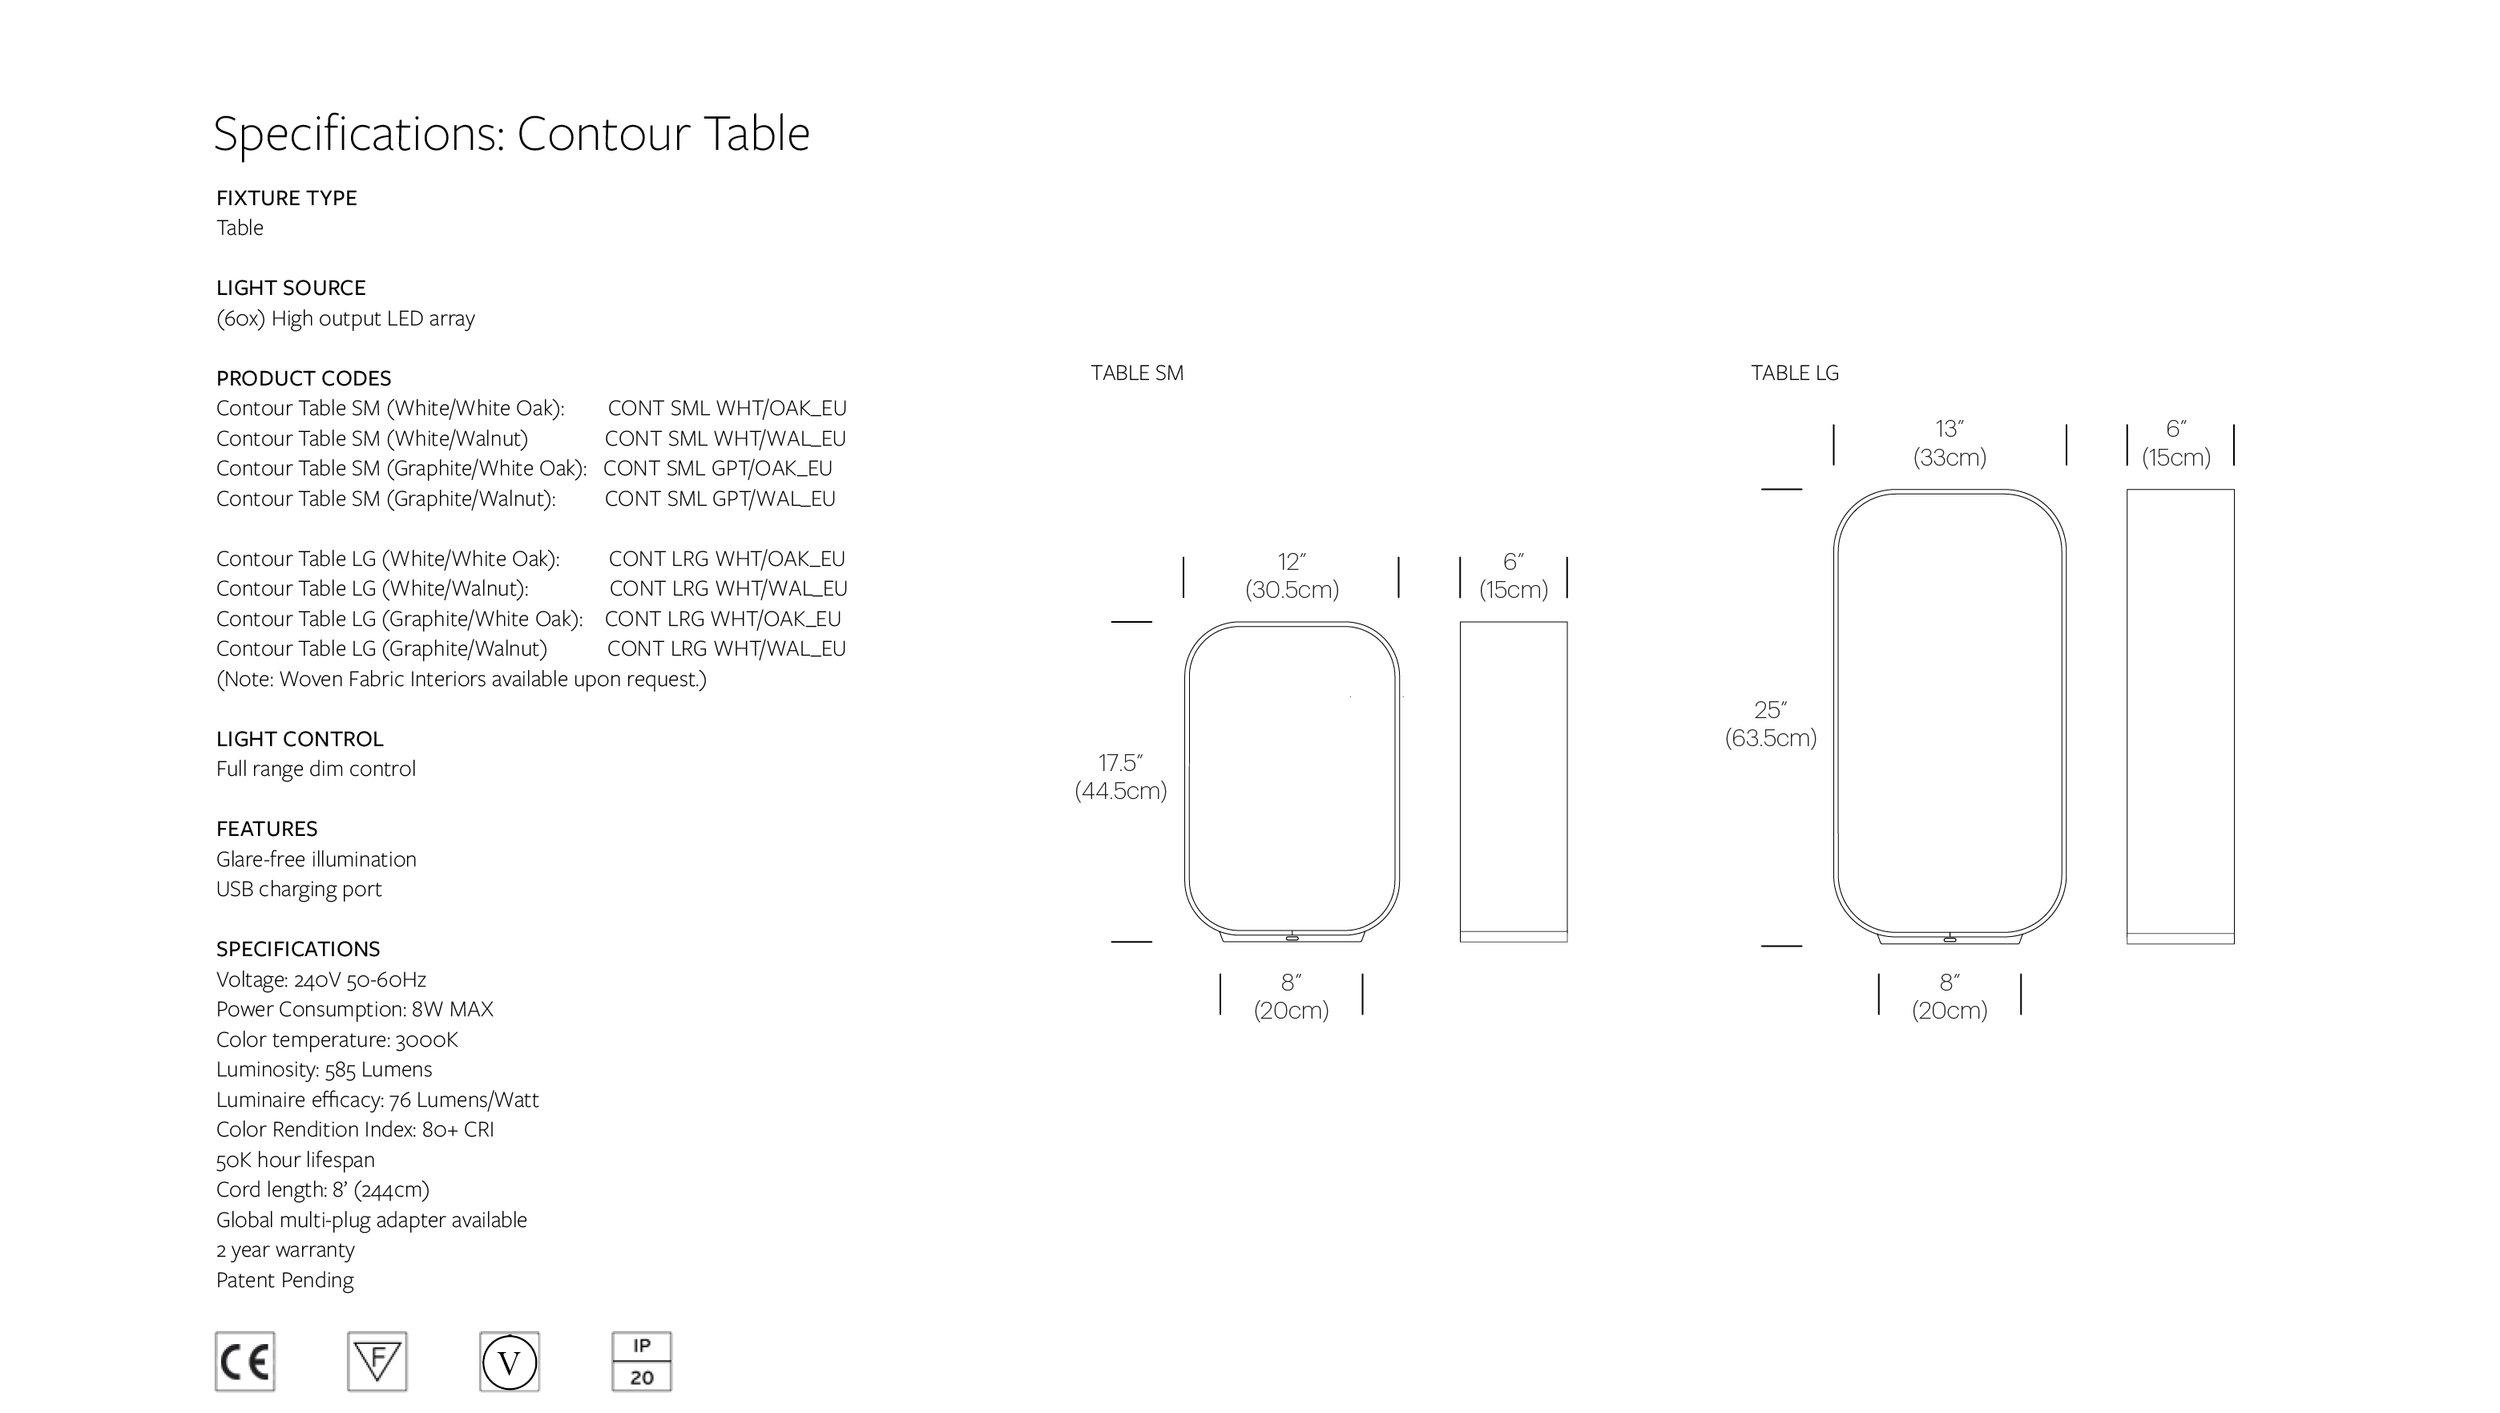 Contour Table English Spec_240V.jpg